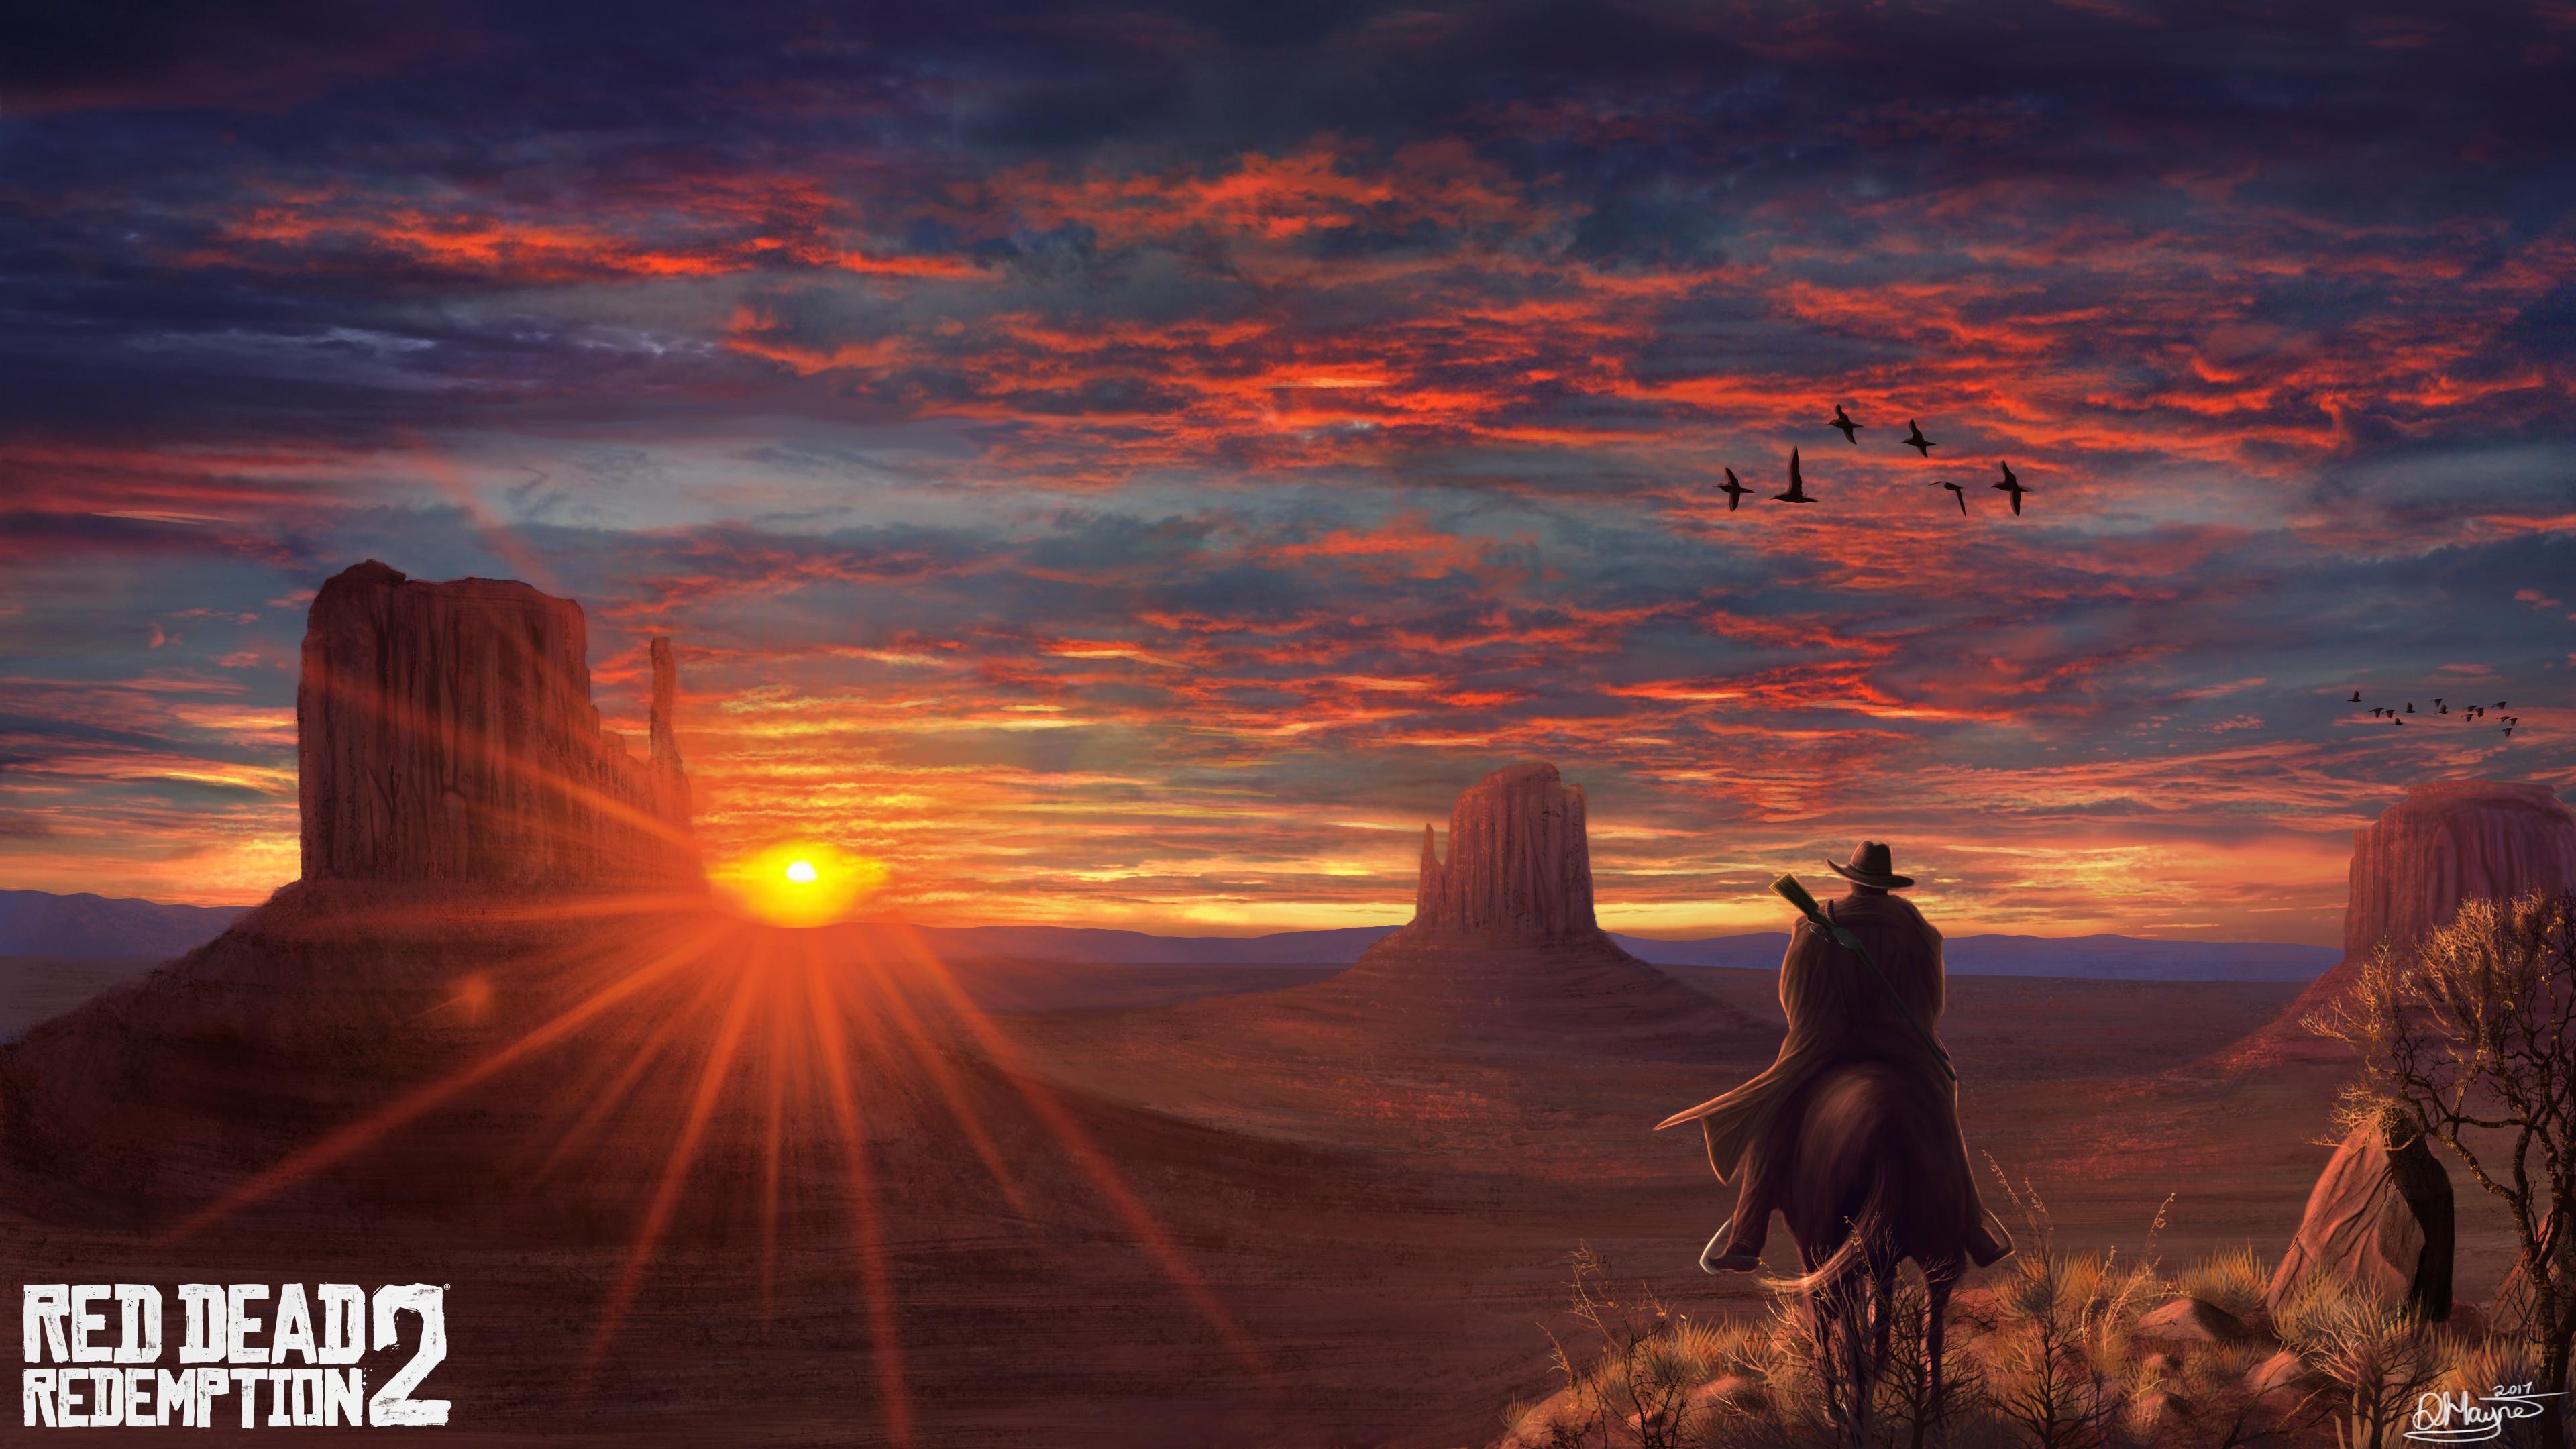 Red Dead Redemption 2 Fanart 4k Hd Games 4k Wallpapers Images